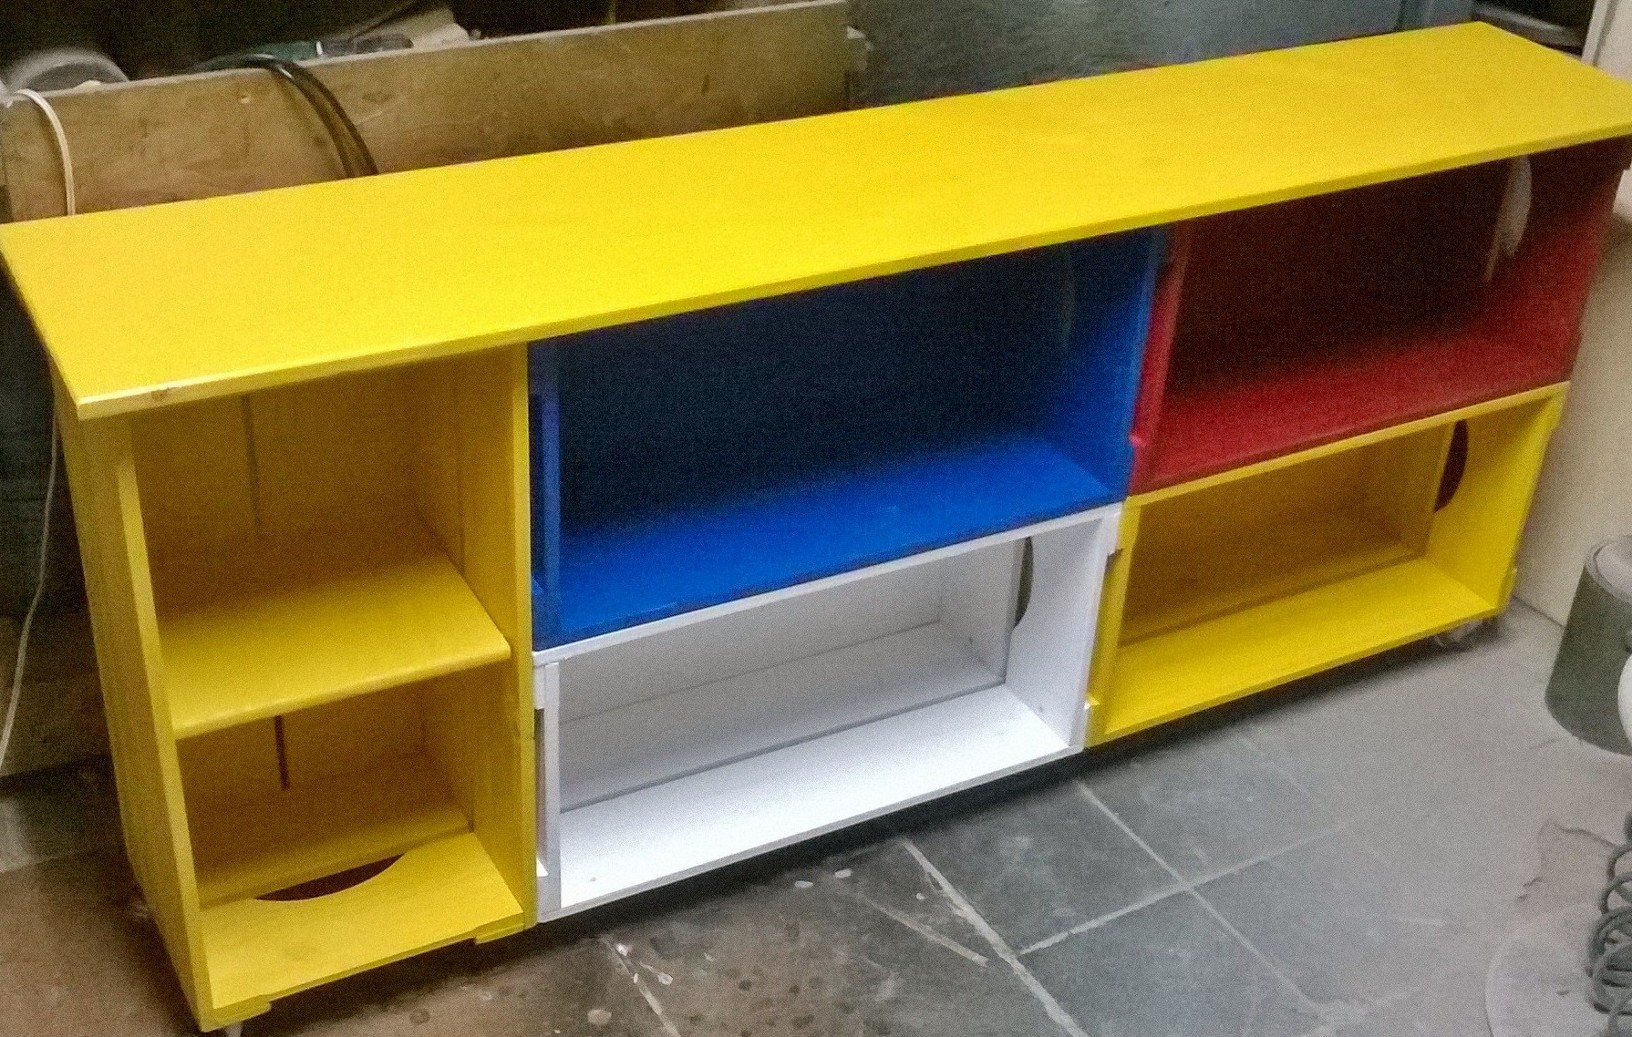 Caixotes de feira oficina ibir for Muebles de oficina trackid sp 006